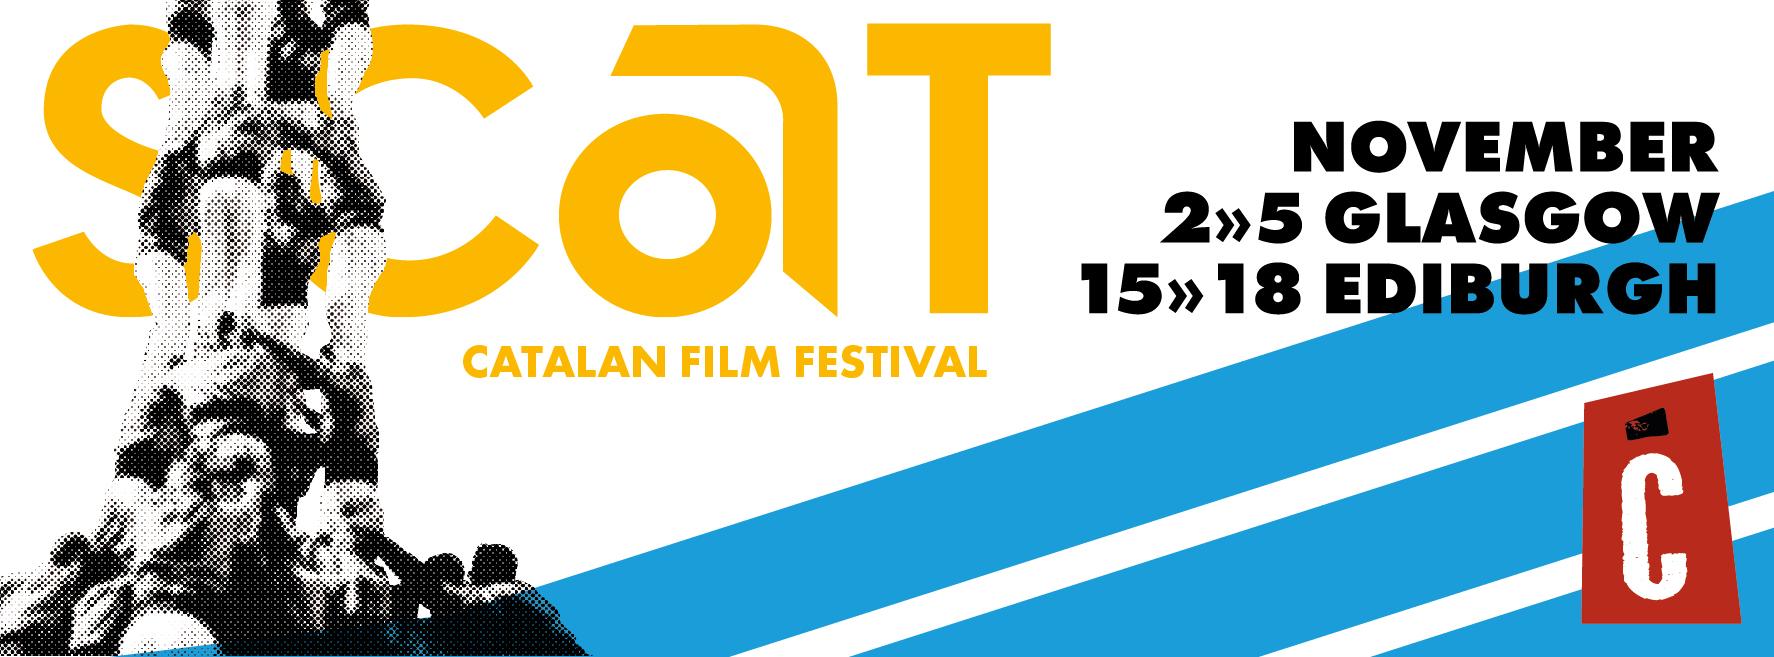 catalan film festival in scotland